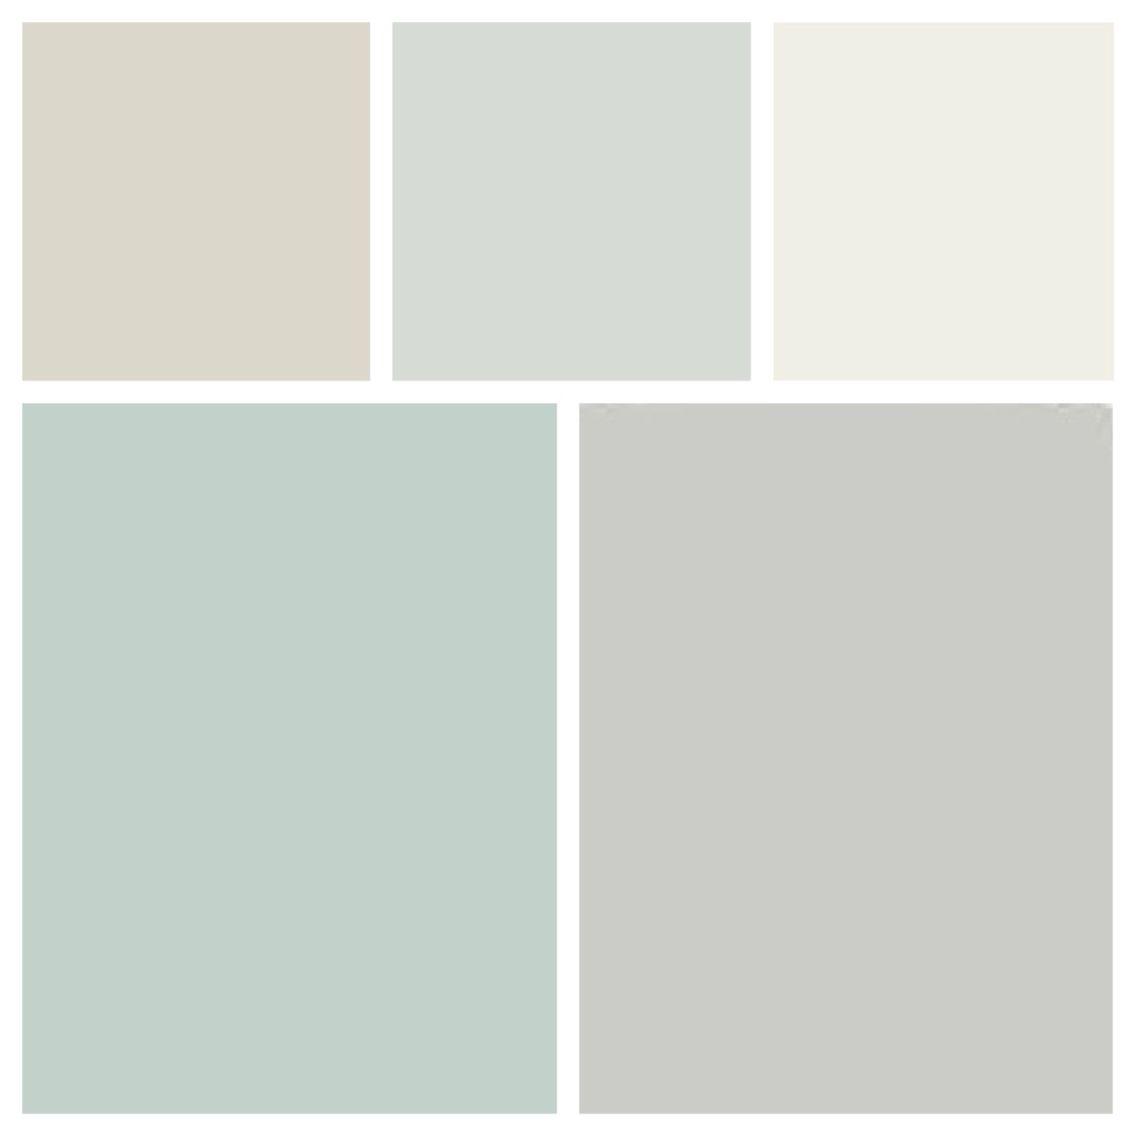 Current Paint Colors And To Do Paint Colors L R Top Bm Balboa Mist Bm Healing Aloe Bm W Interior Paint Colors For Living Room Palladian Blue Balboa Mist